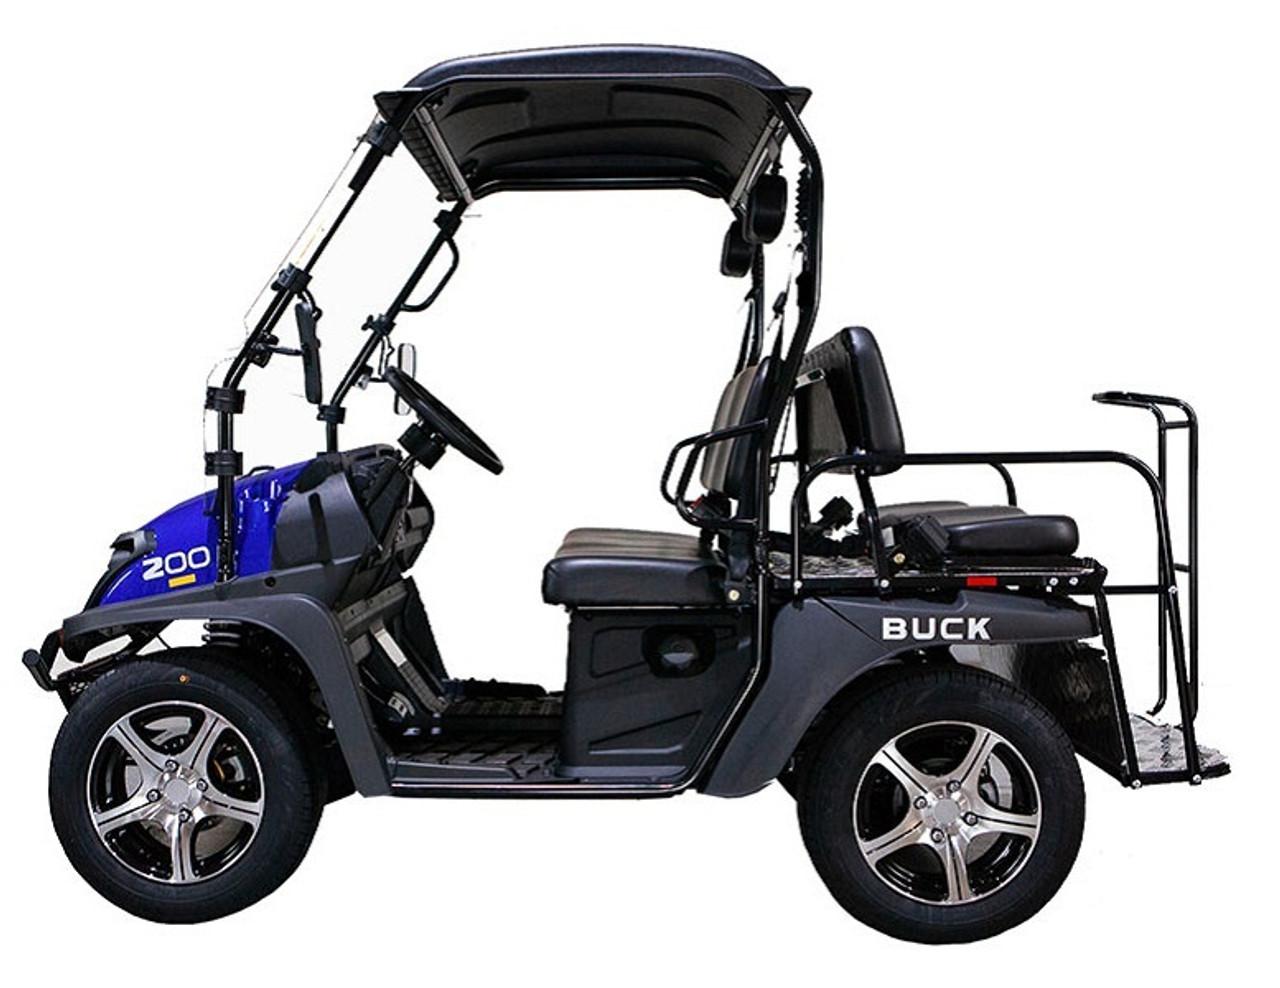 BLUE - MASSIMO BUCK 200X UTV, 177cc Four-Stroke, Single Cylinder